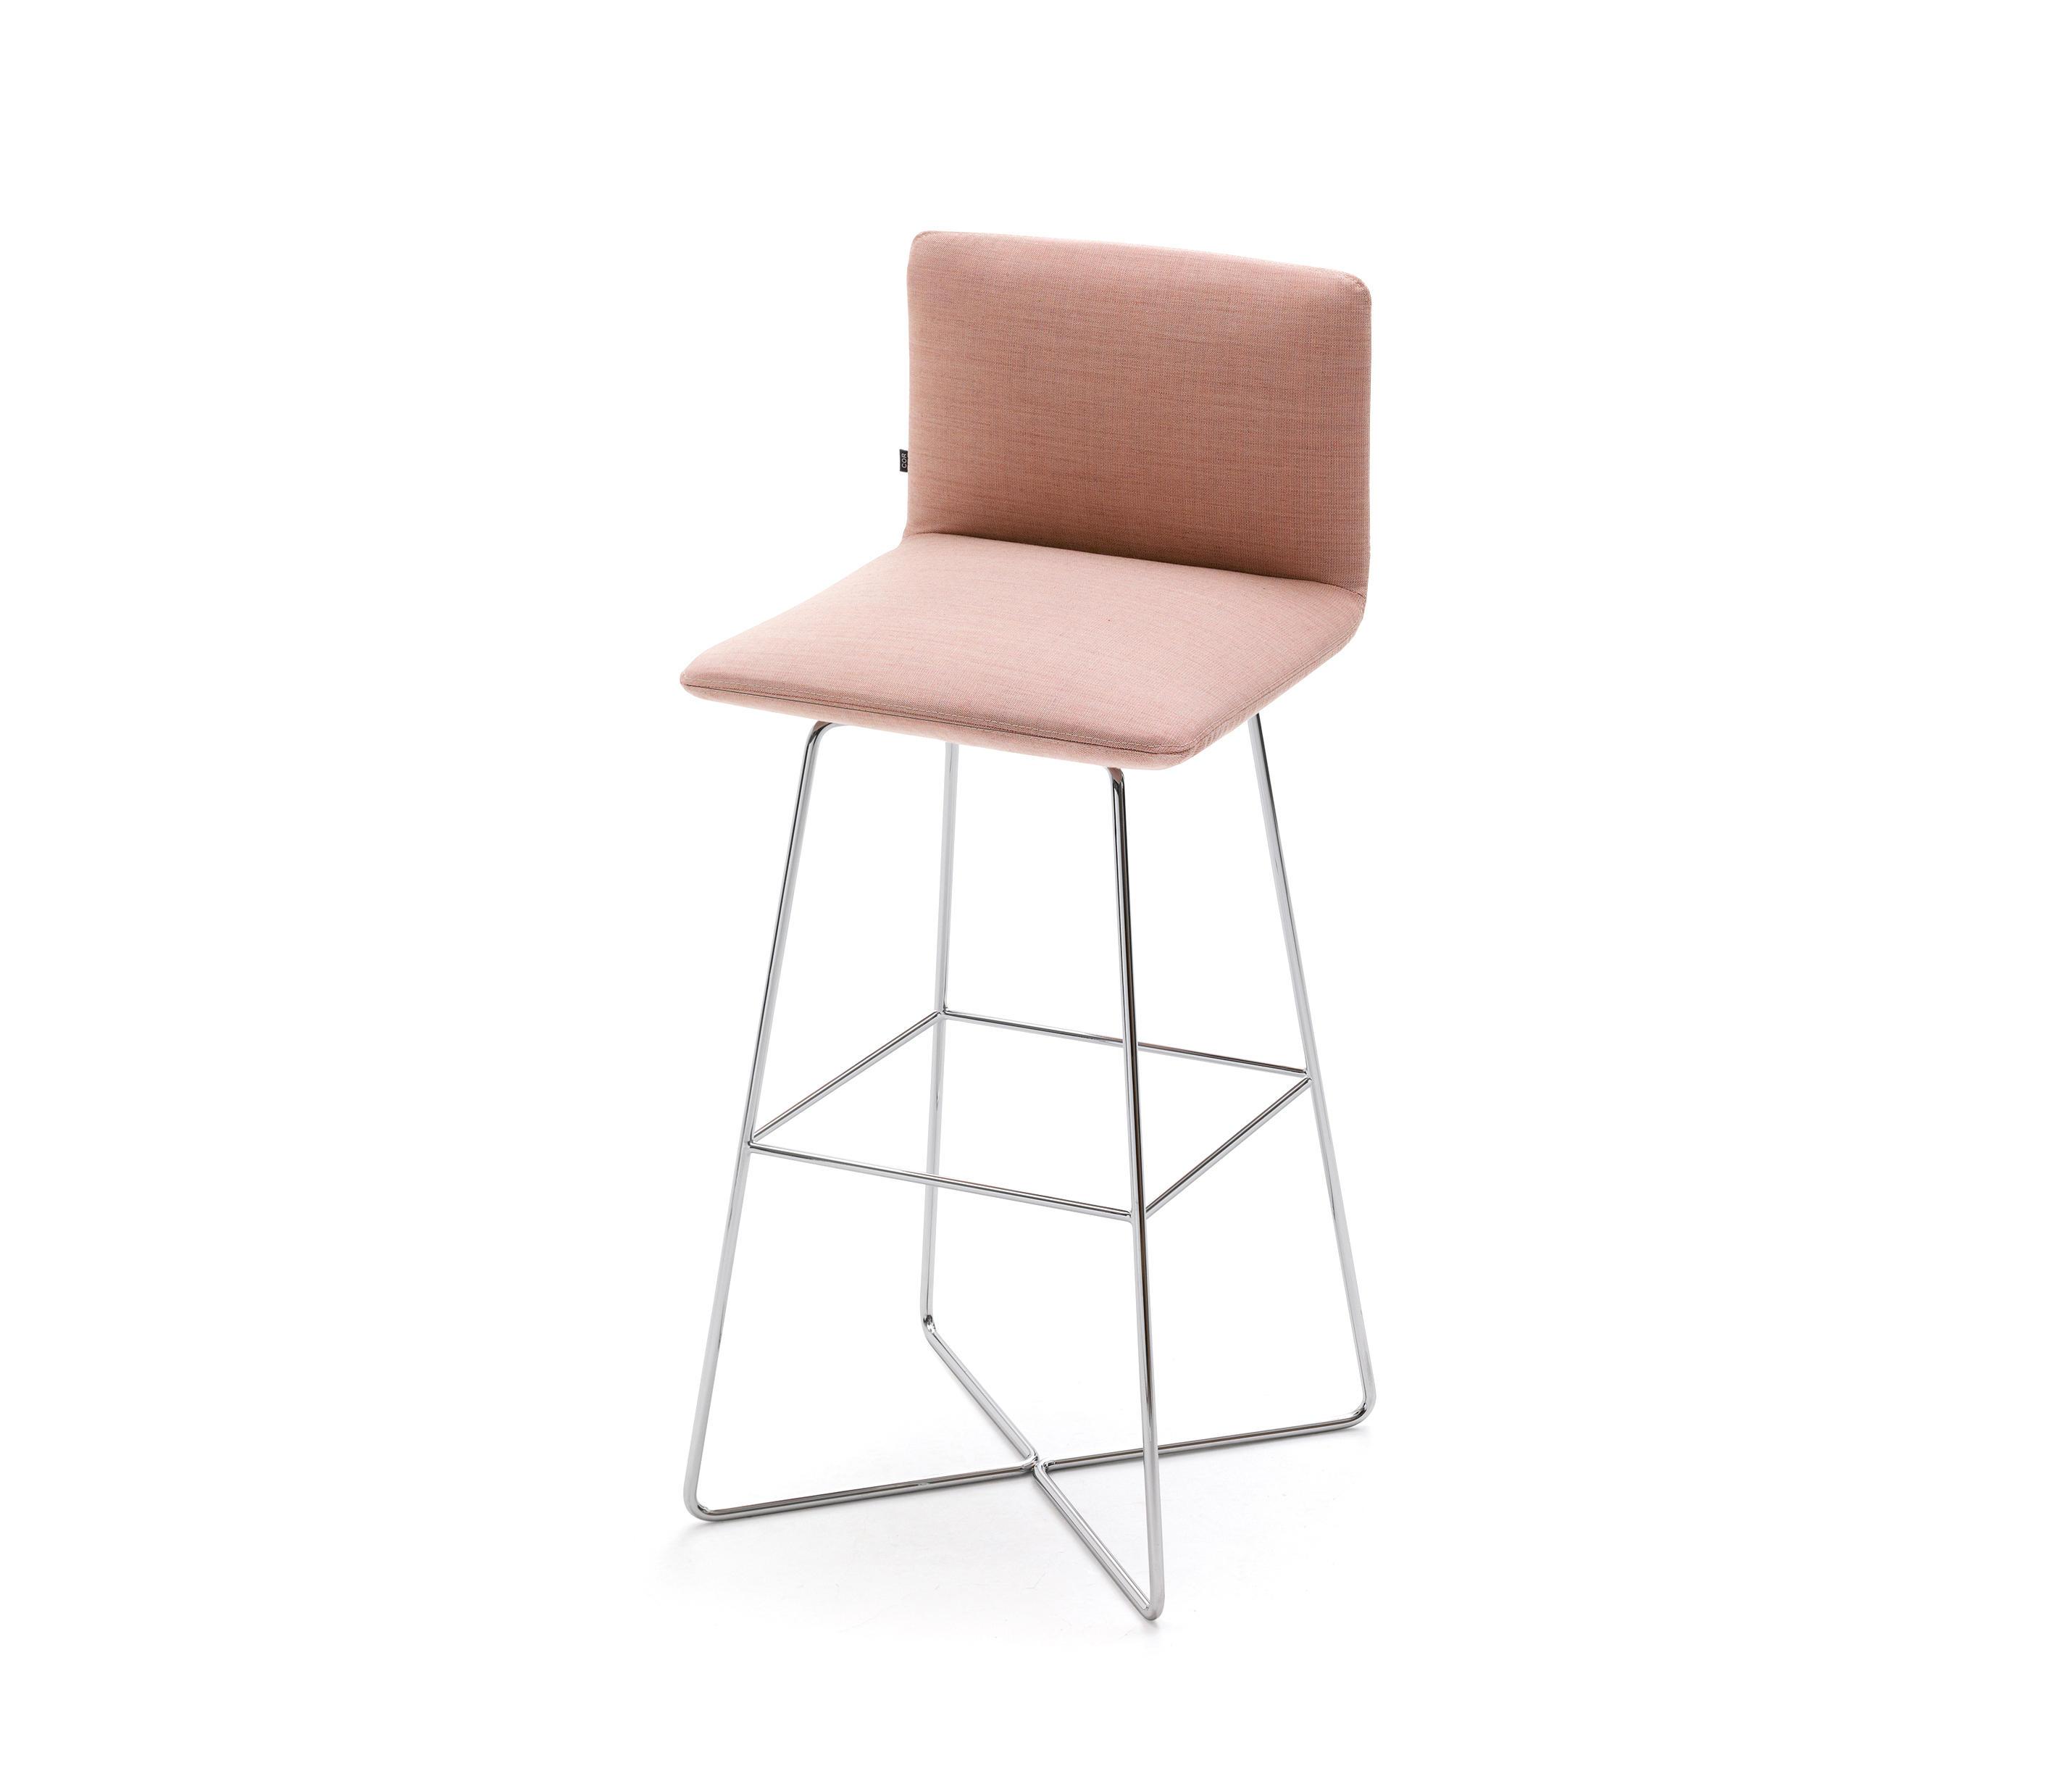 jalis barhocker von cor architonic. Black Bedroom Furniture Sets. Home Design Ideas